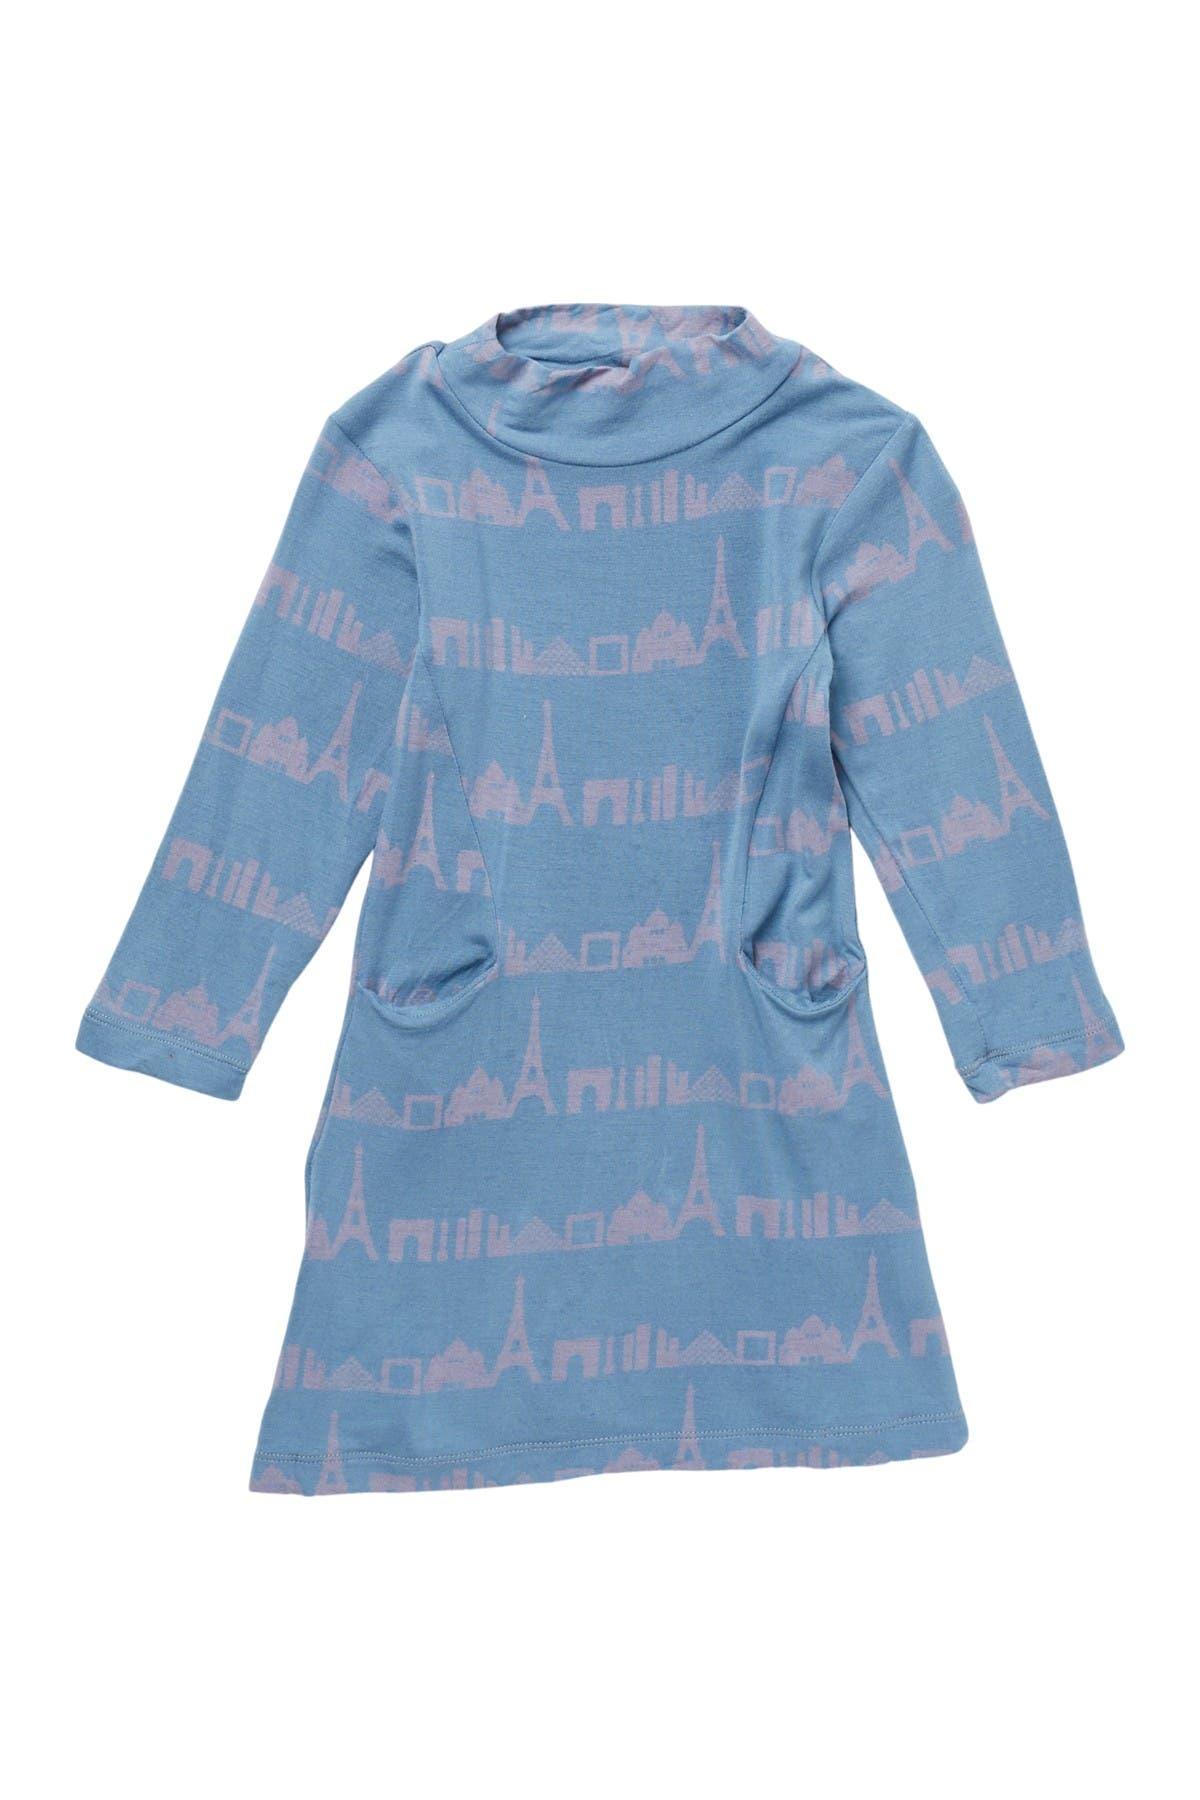 Image of KicKee Pants Patterned Mock Neck Sweater Dress